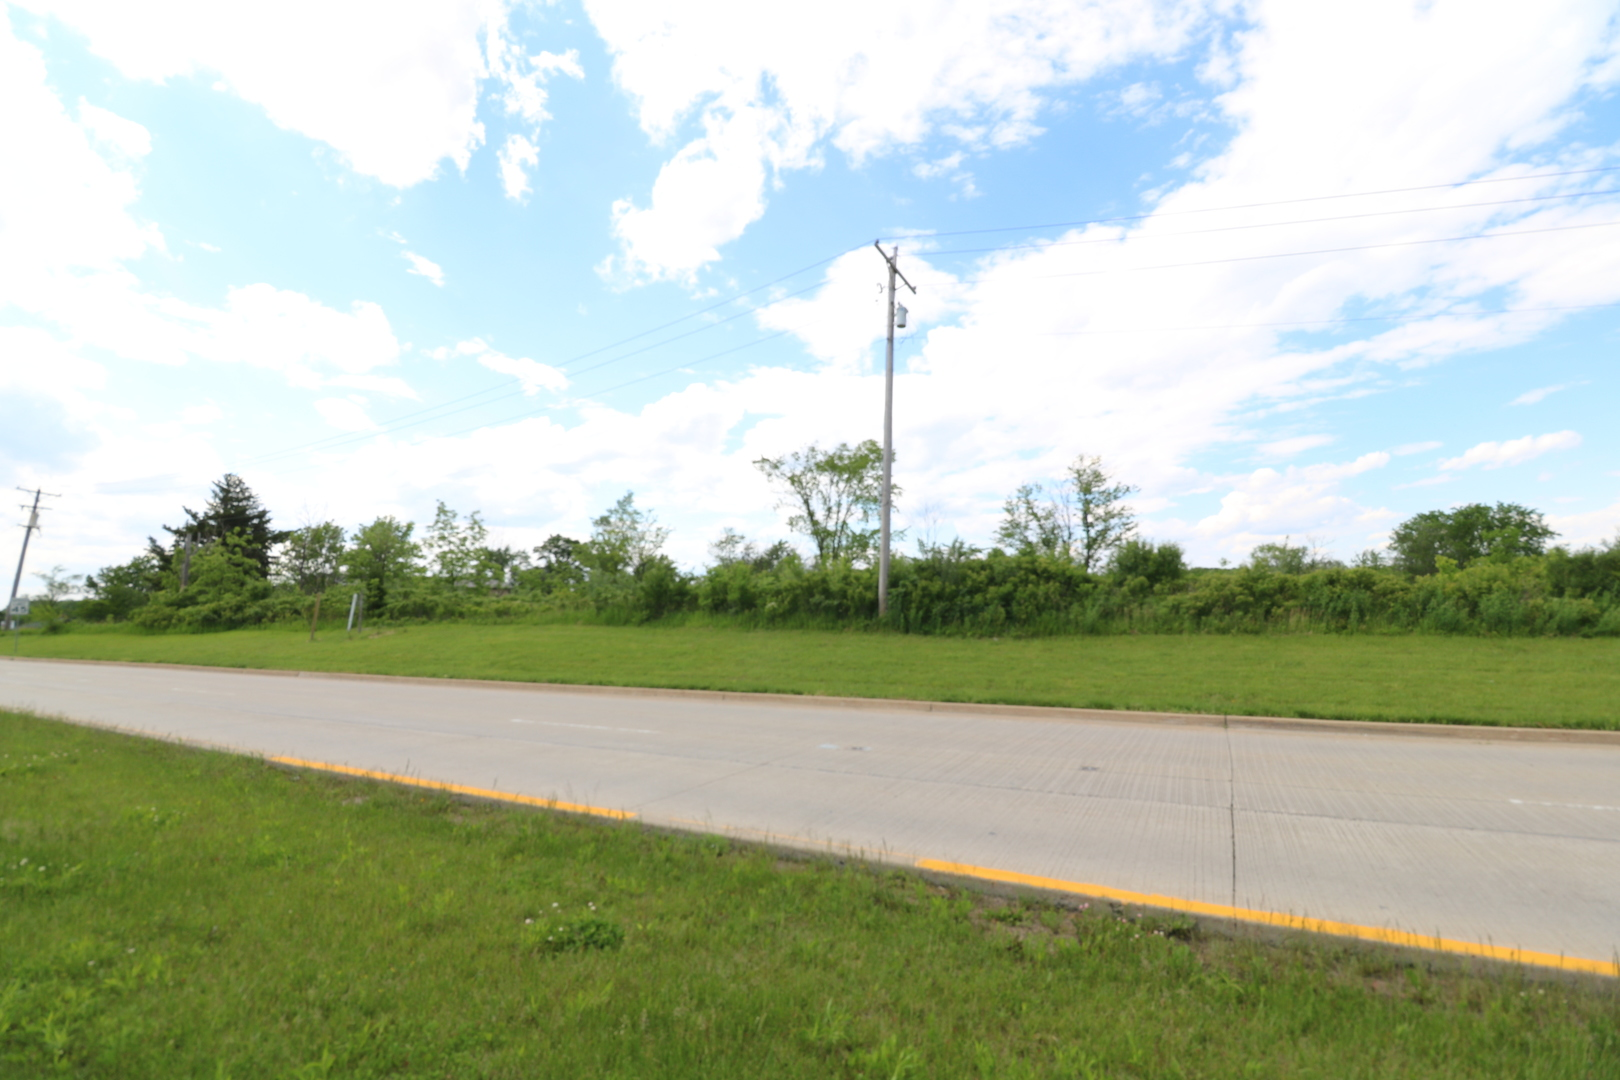 16370 West 159th Street Lockport, IL - Image 1